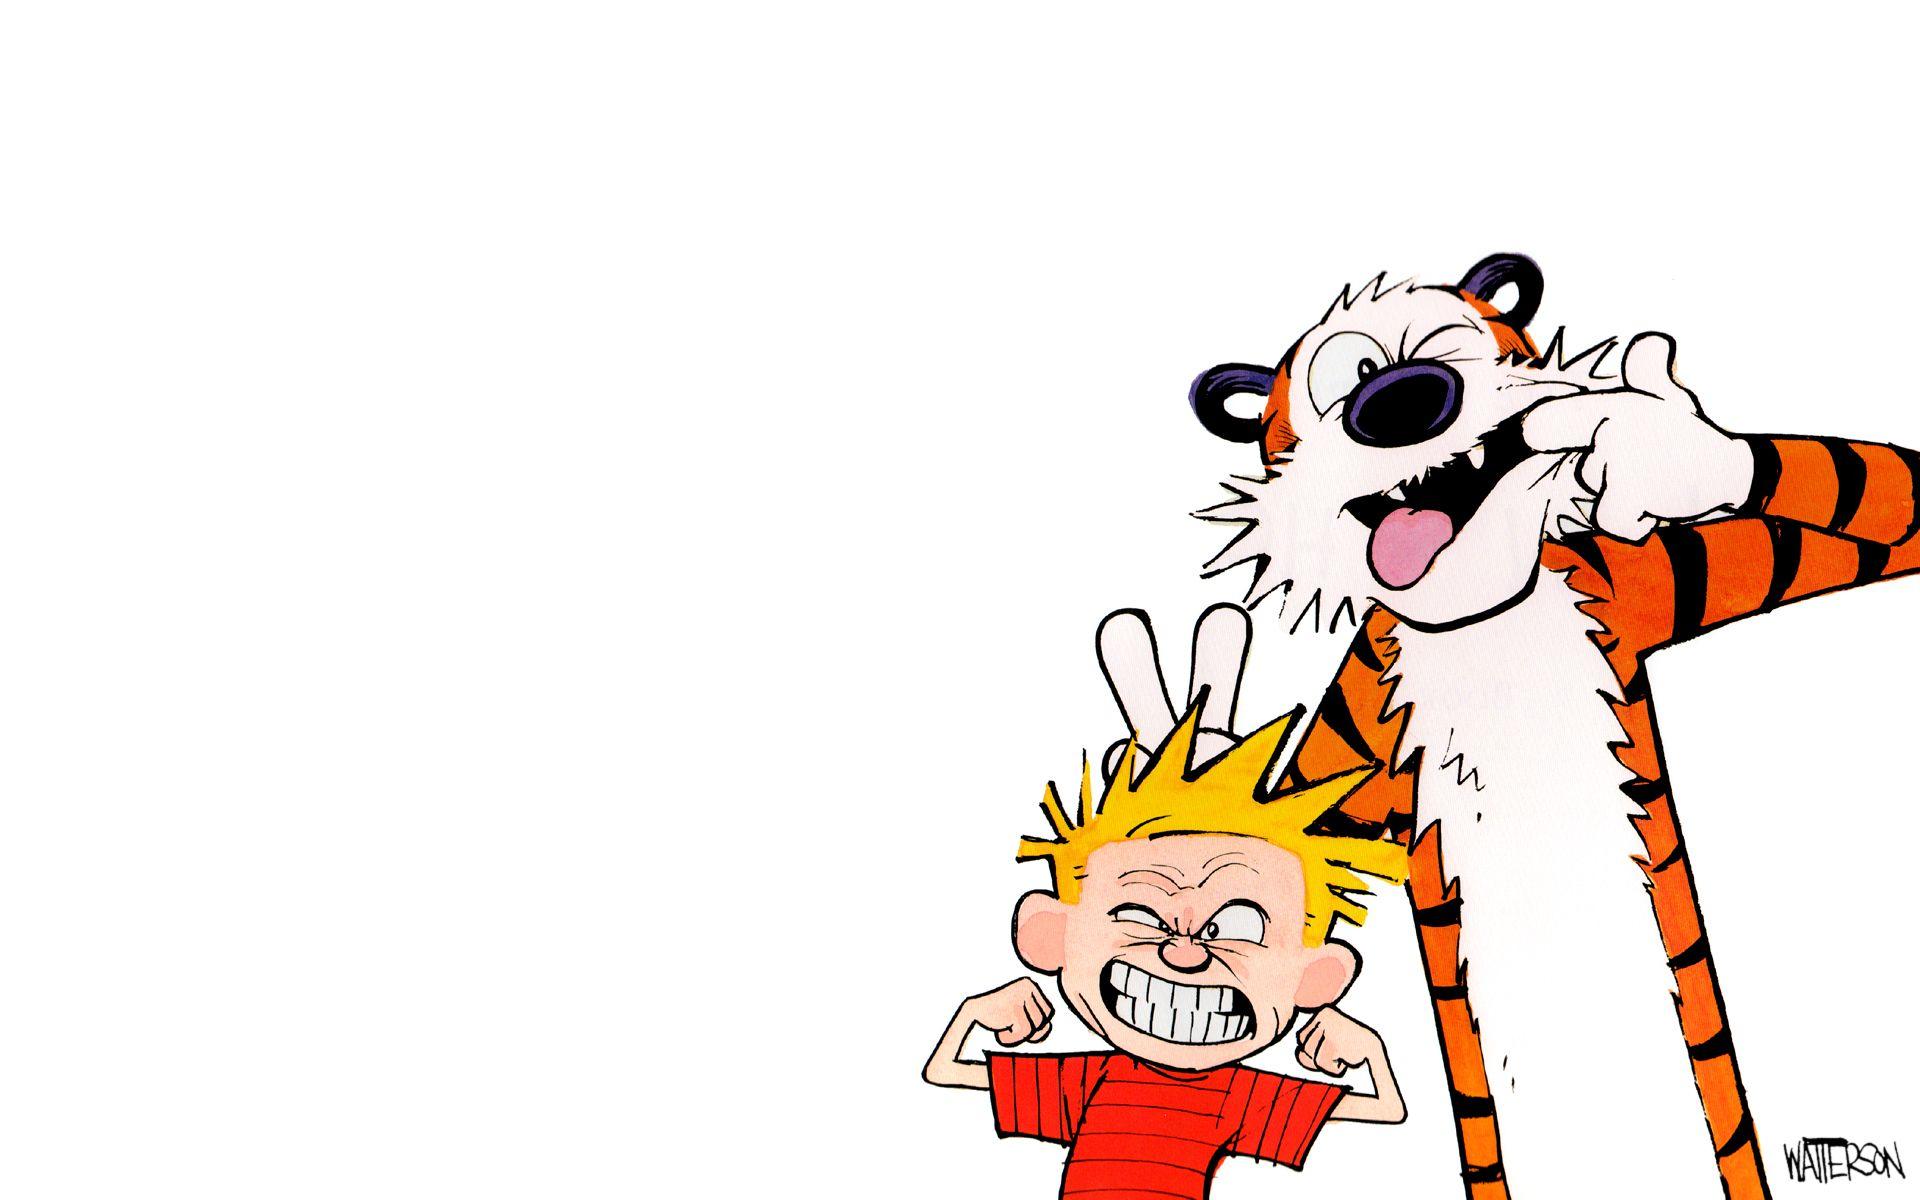 Pin de Felipe Zuniga en Calvin and Hobbes | Pinterest | Ilustrador y ...